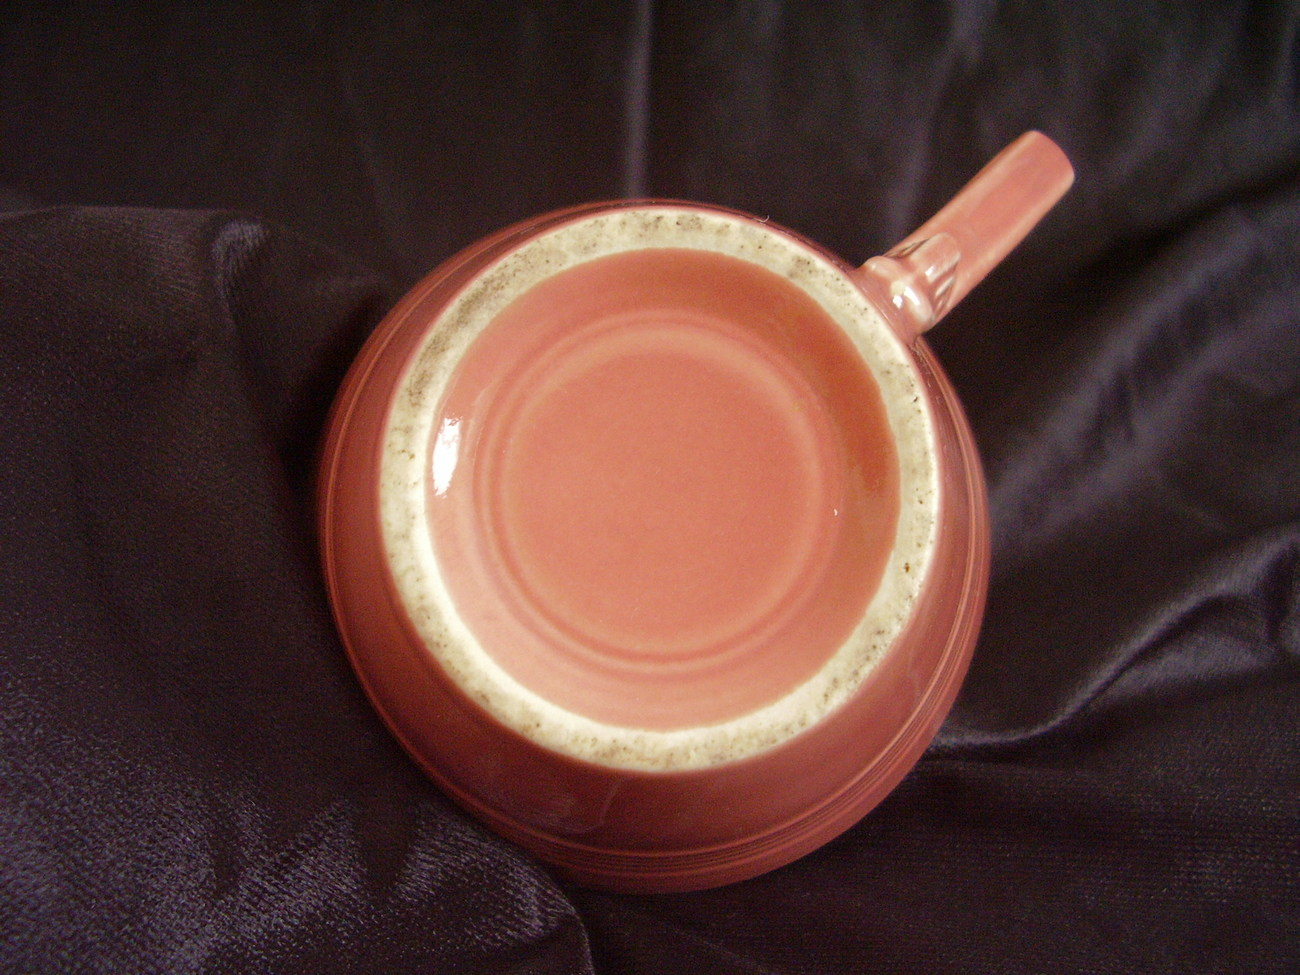 Vintage Homer Laughlin Harlequin Rose Teacup Coffee Cup